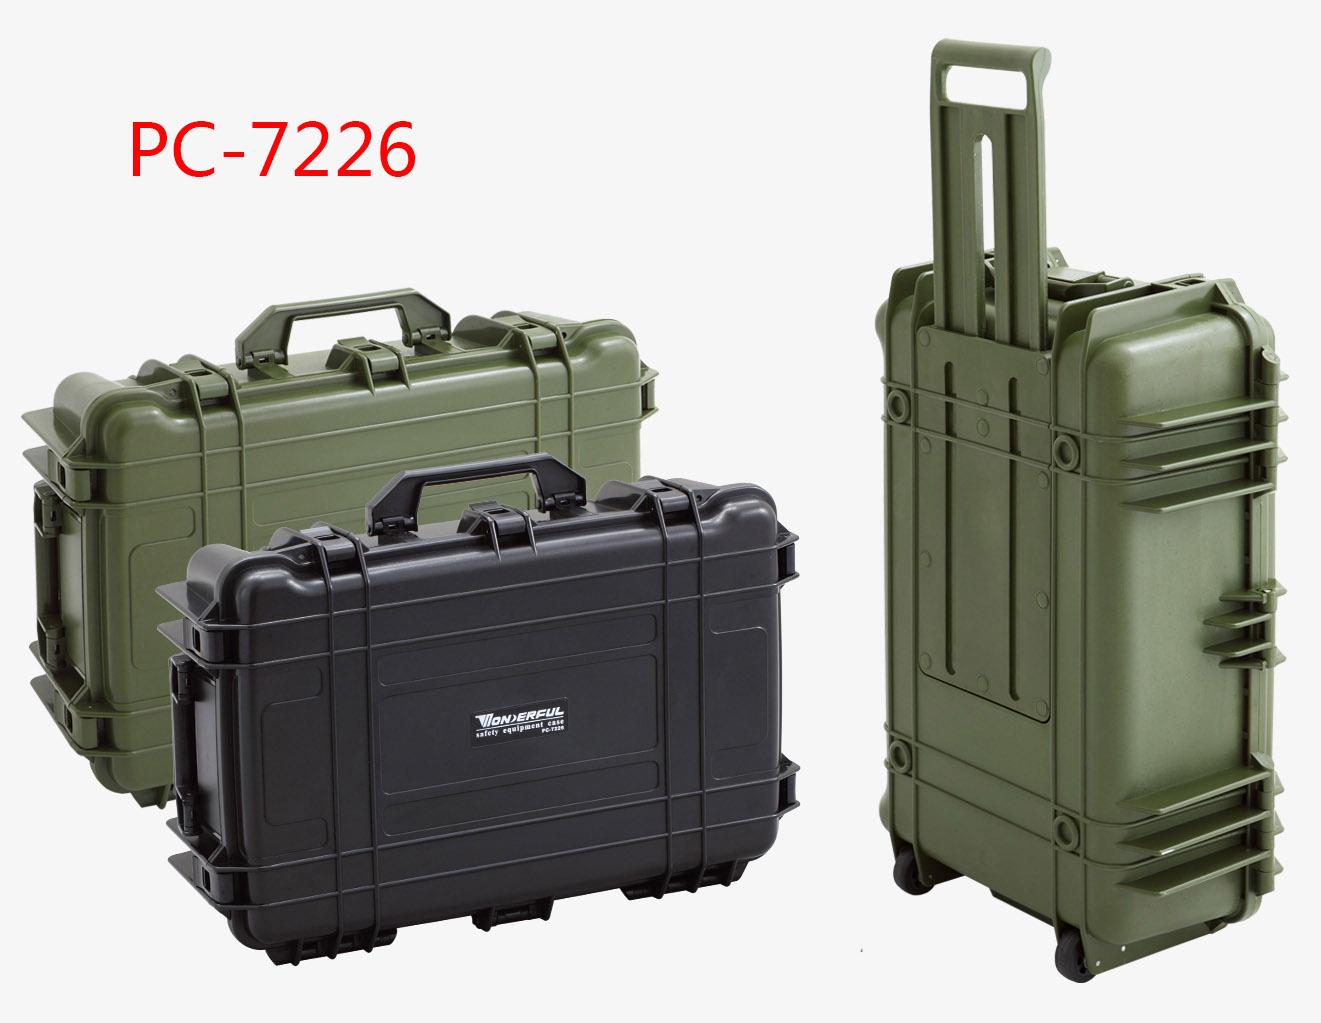 PC-7226安全仪器拉杆箱